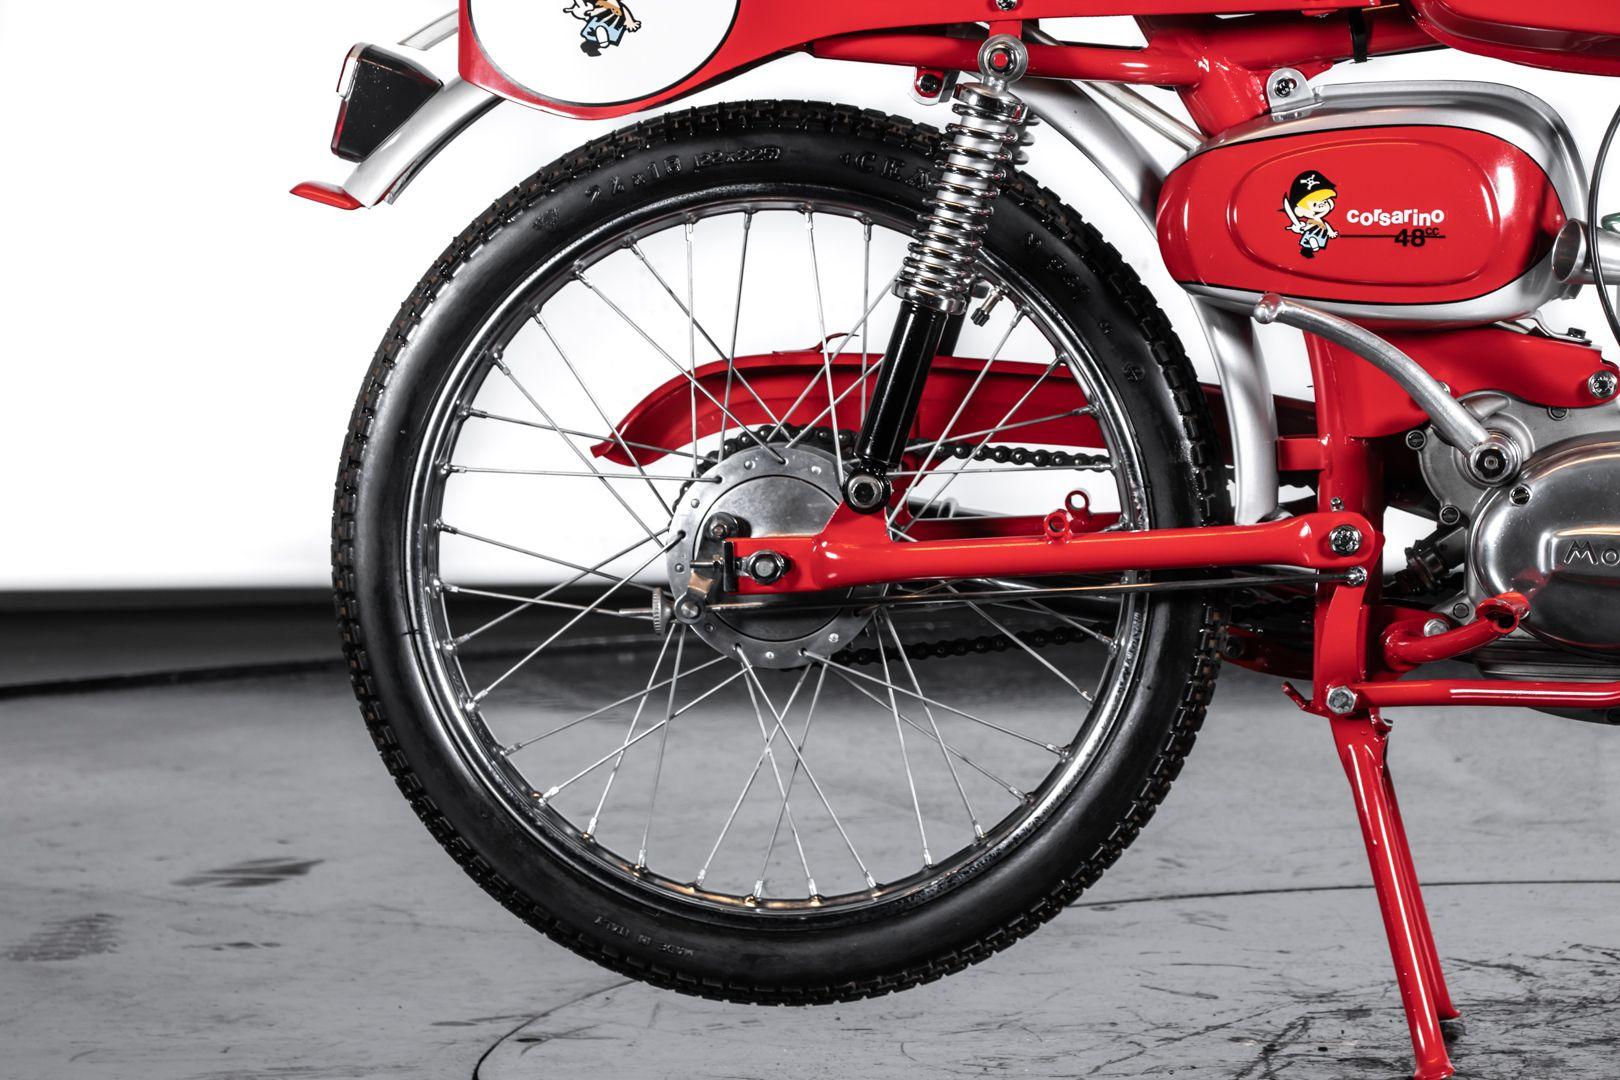 1966 Moto Morini Corsarino Z 60cc 76726